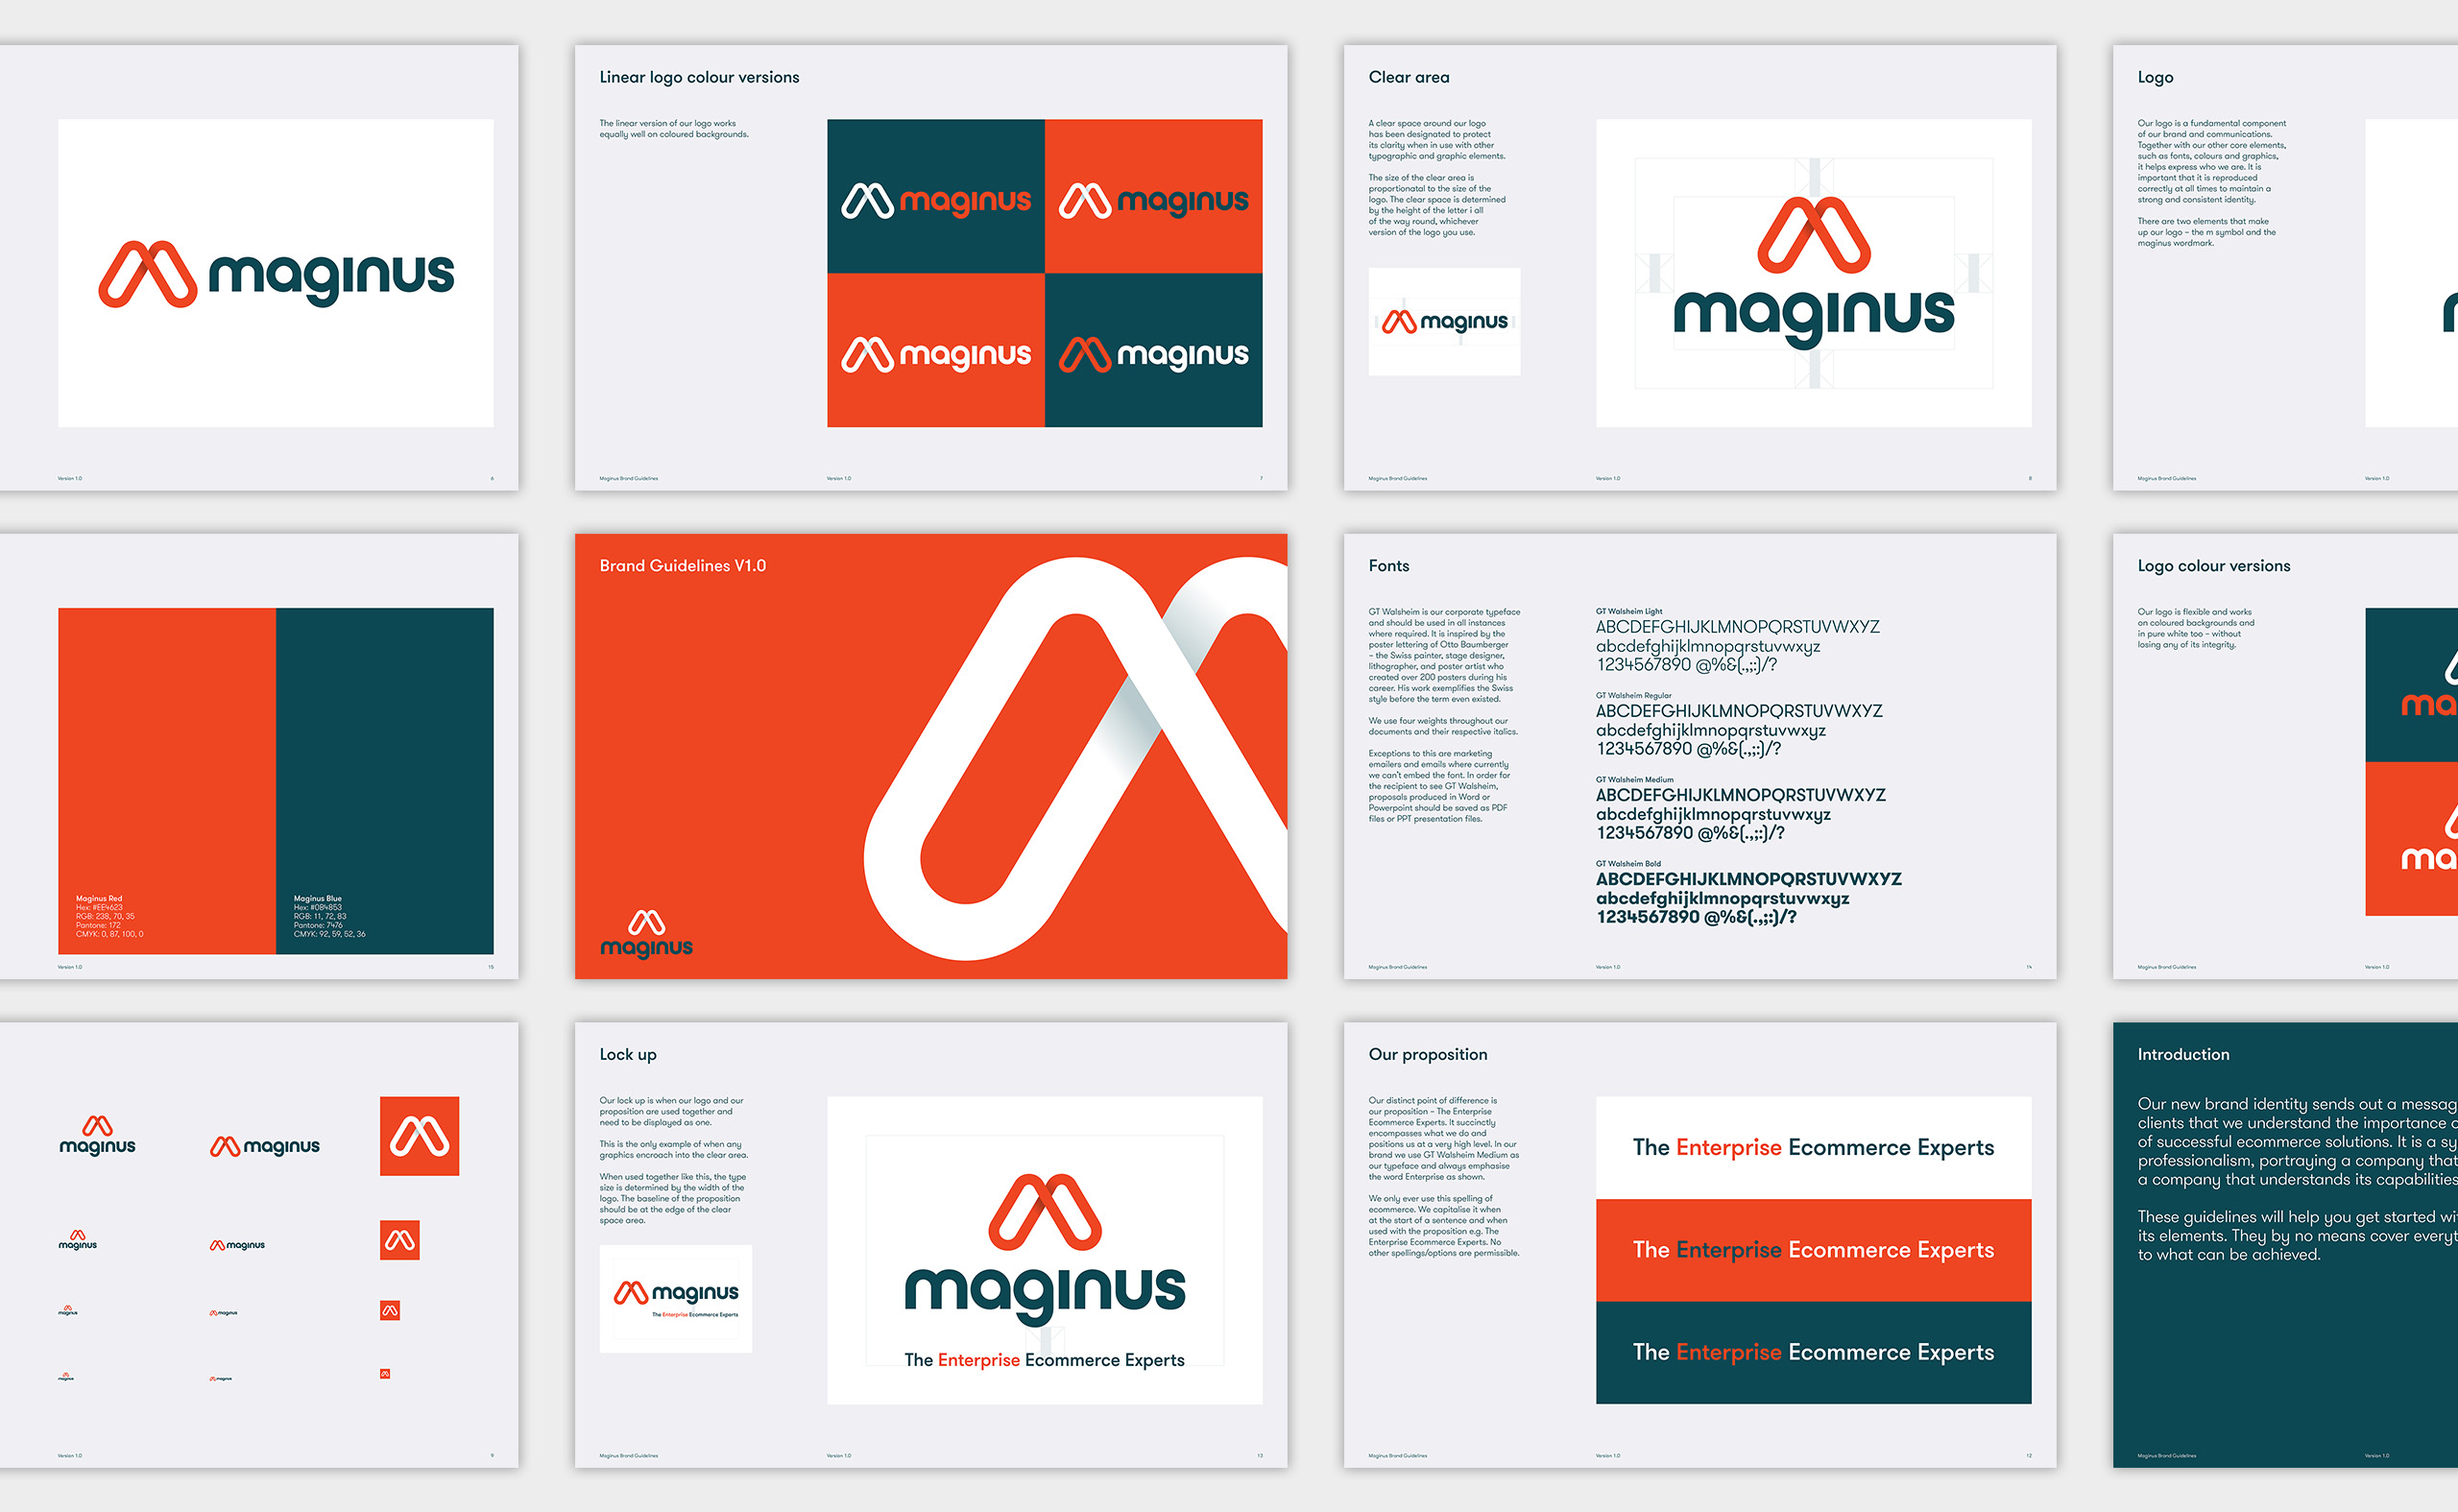 maginus-brand-guidelines